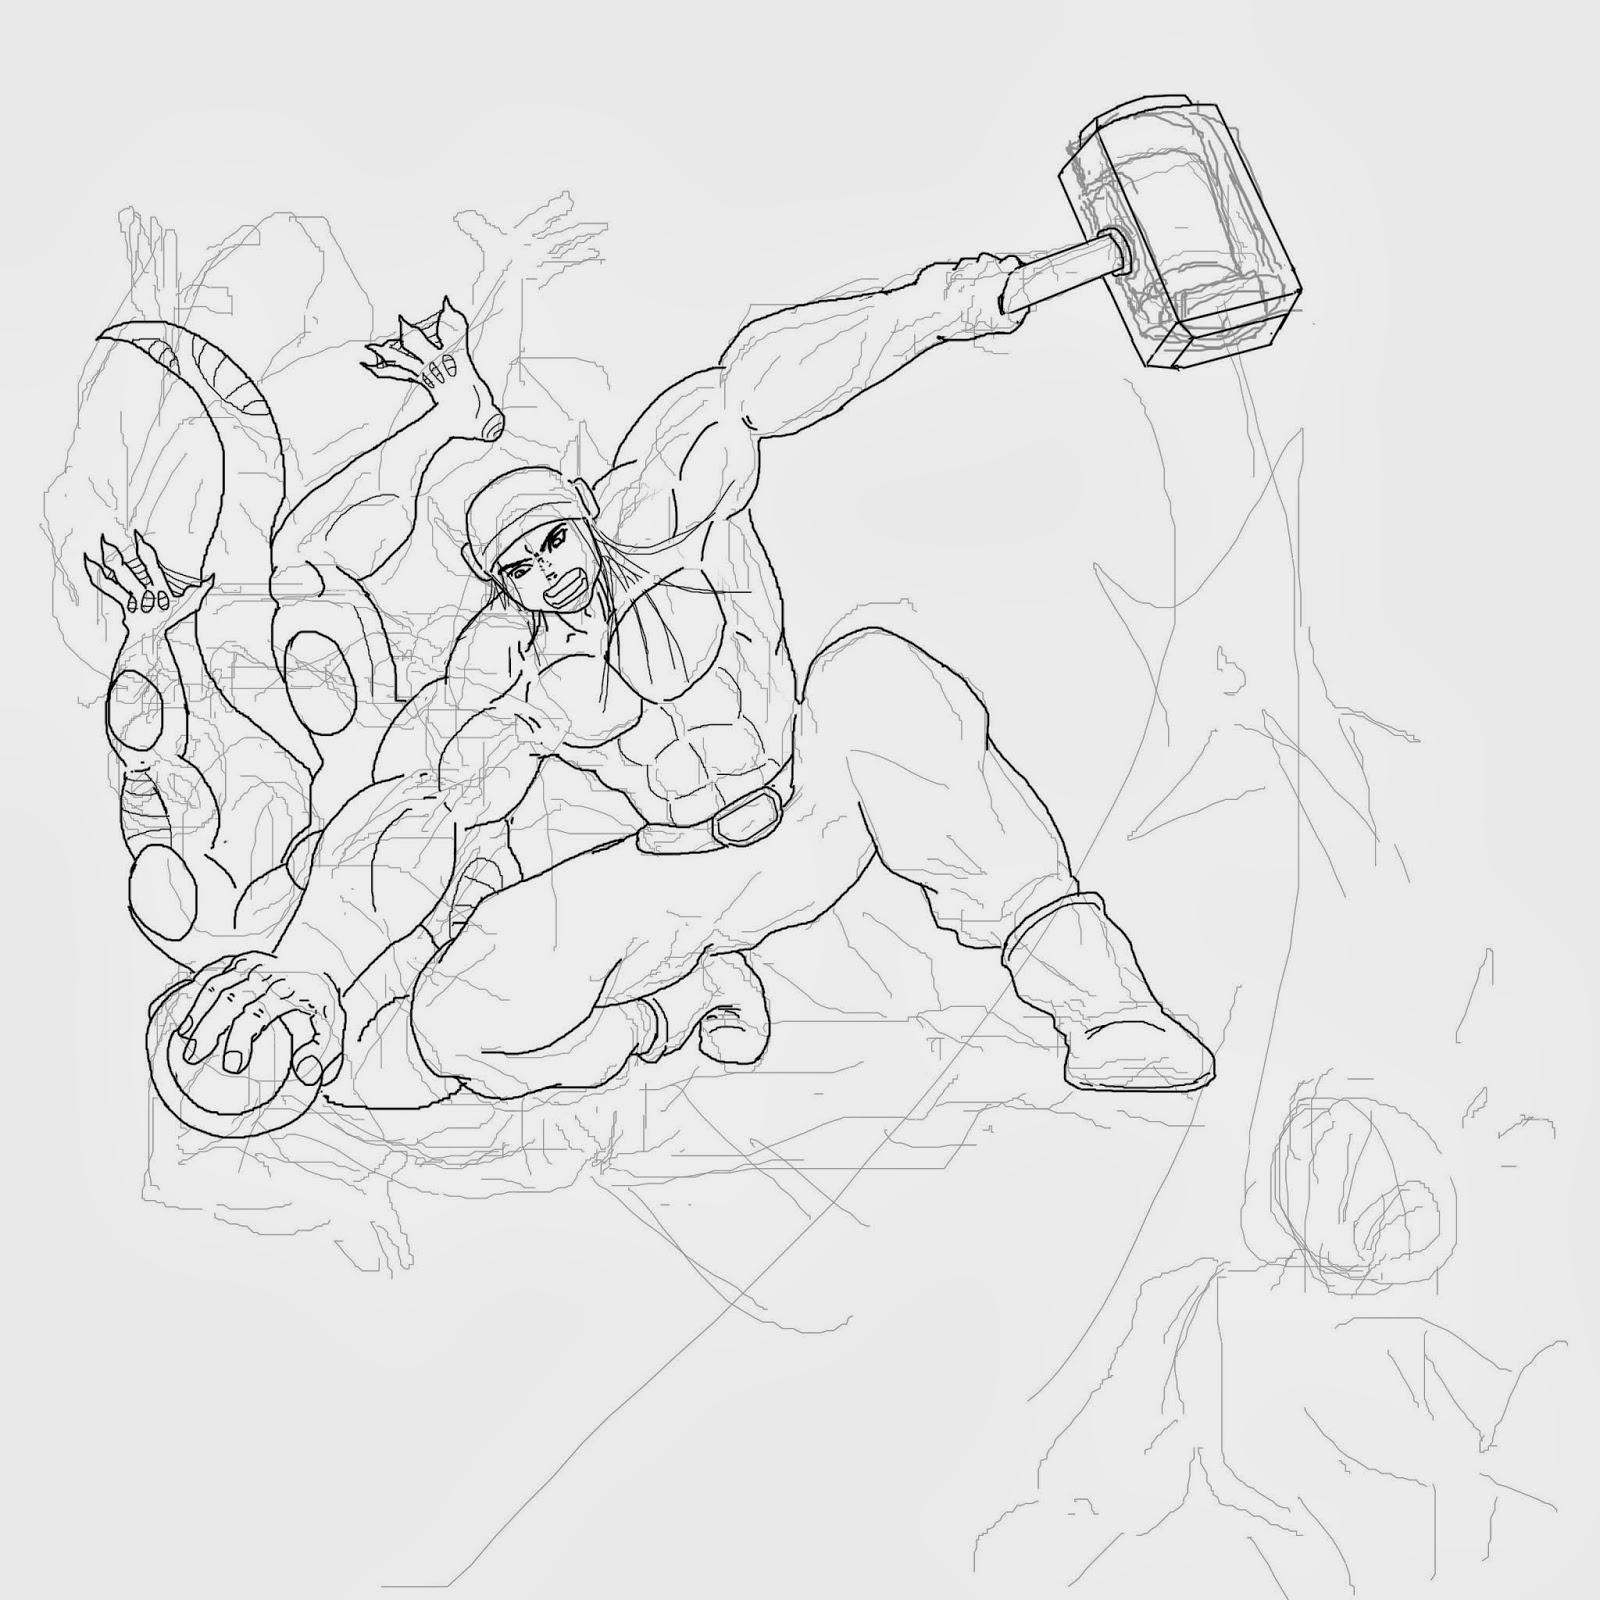 sketchthorHulk.jpg